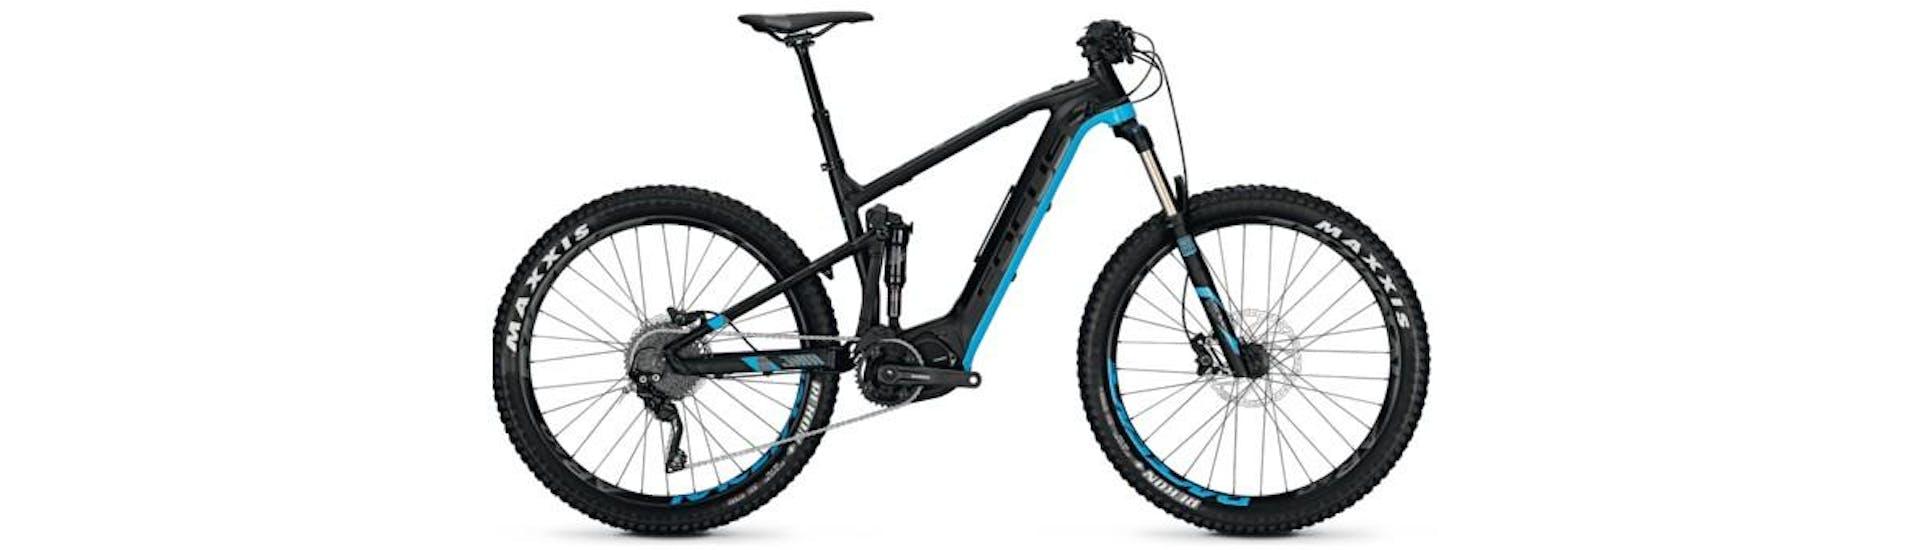 Rental - E-Mountain Bike for Adults